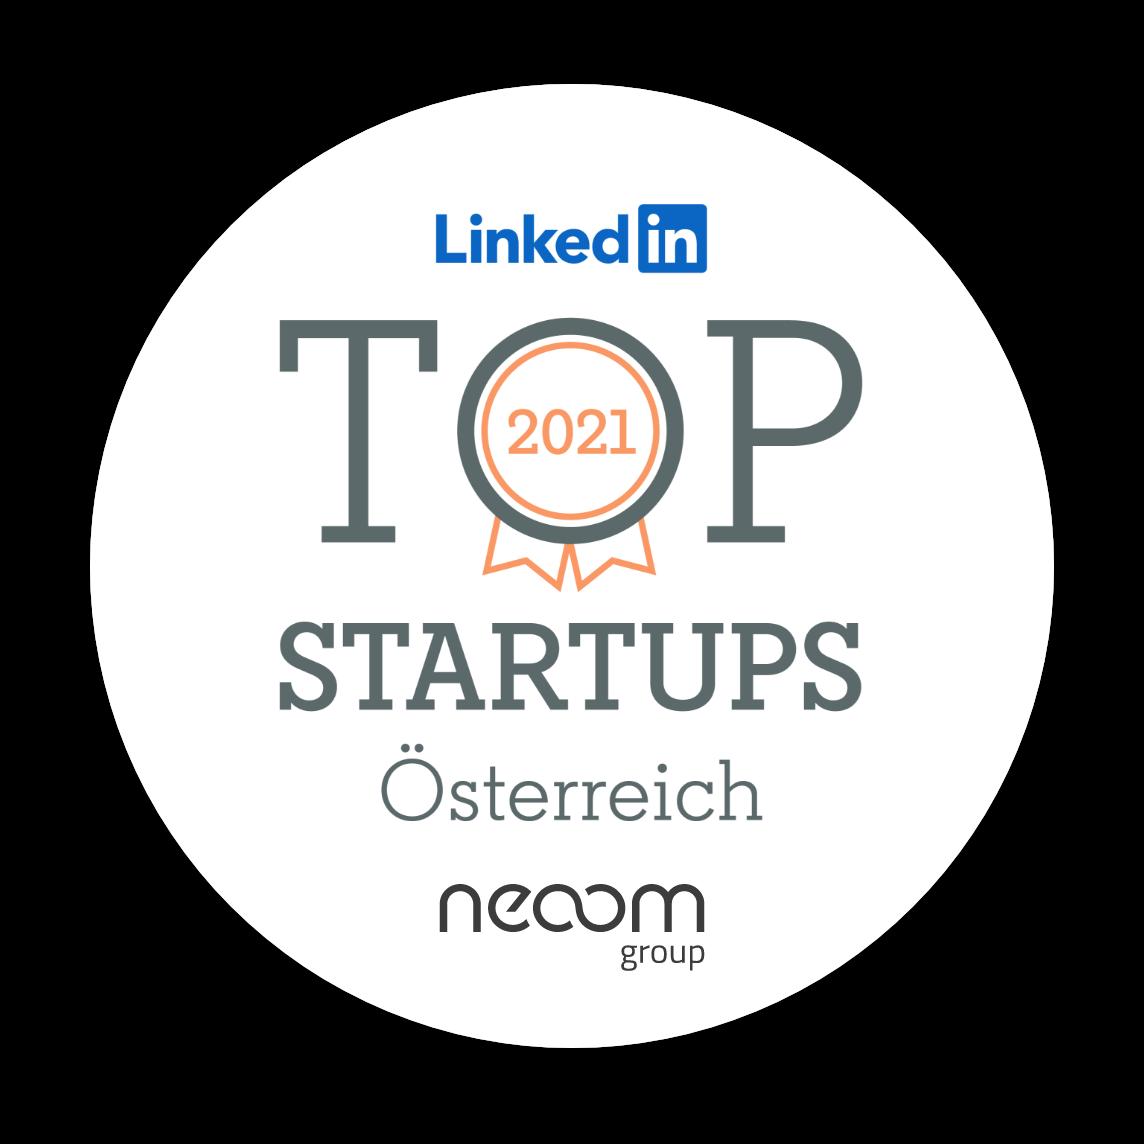 linkedin top startup2021